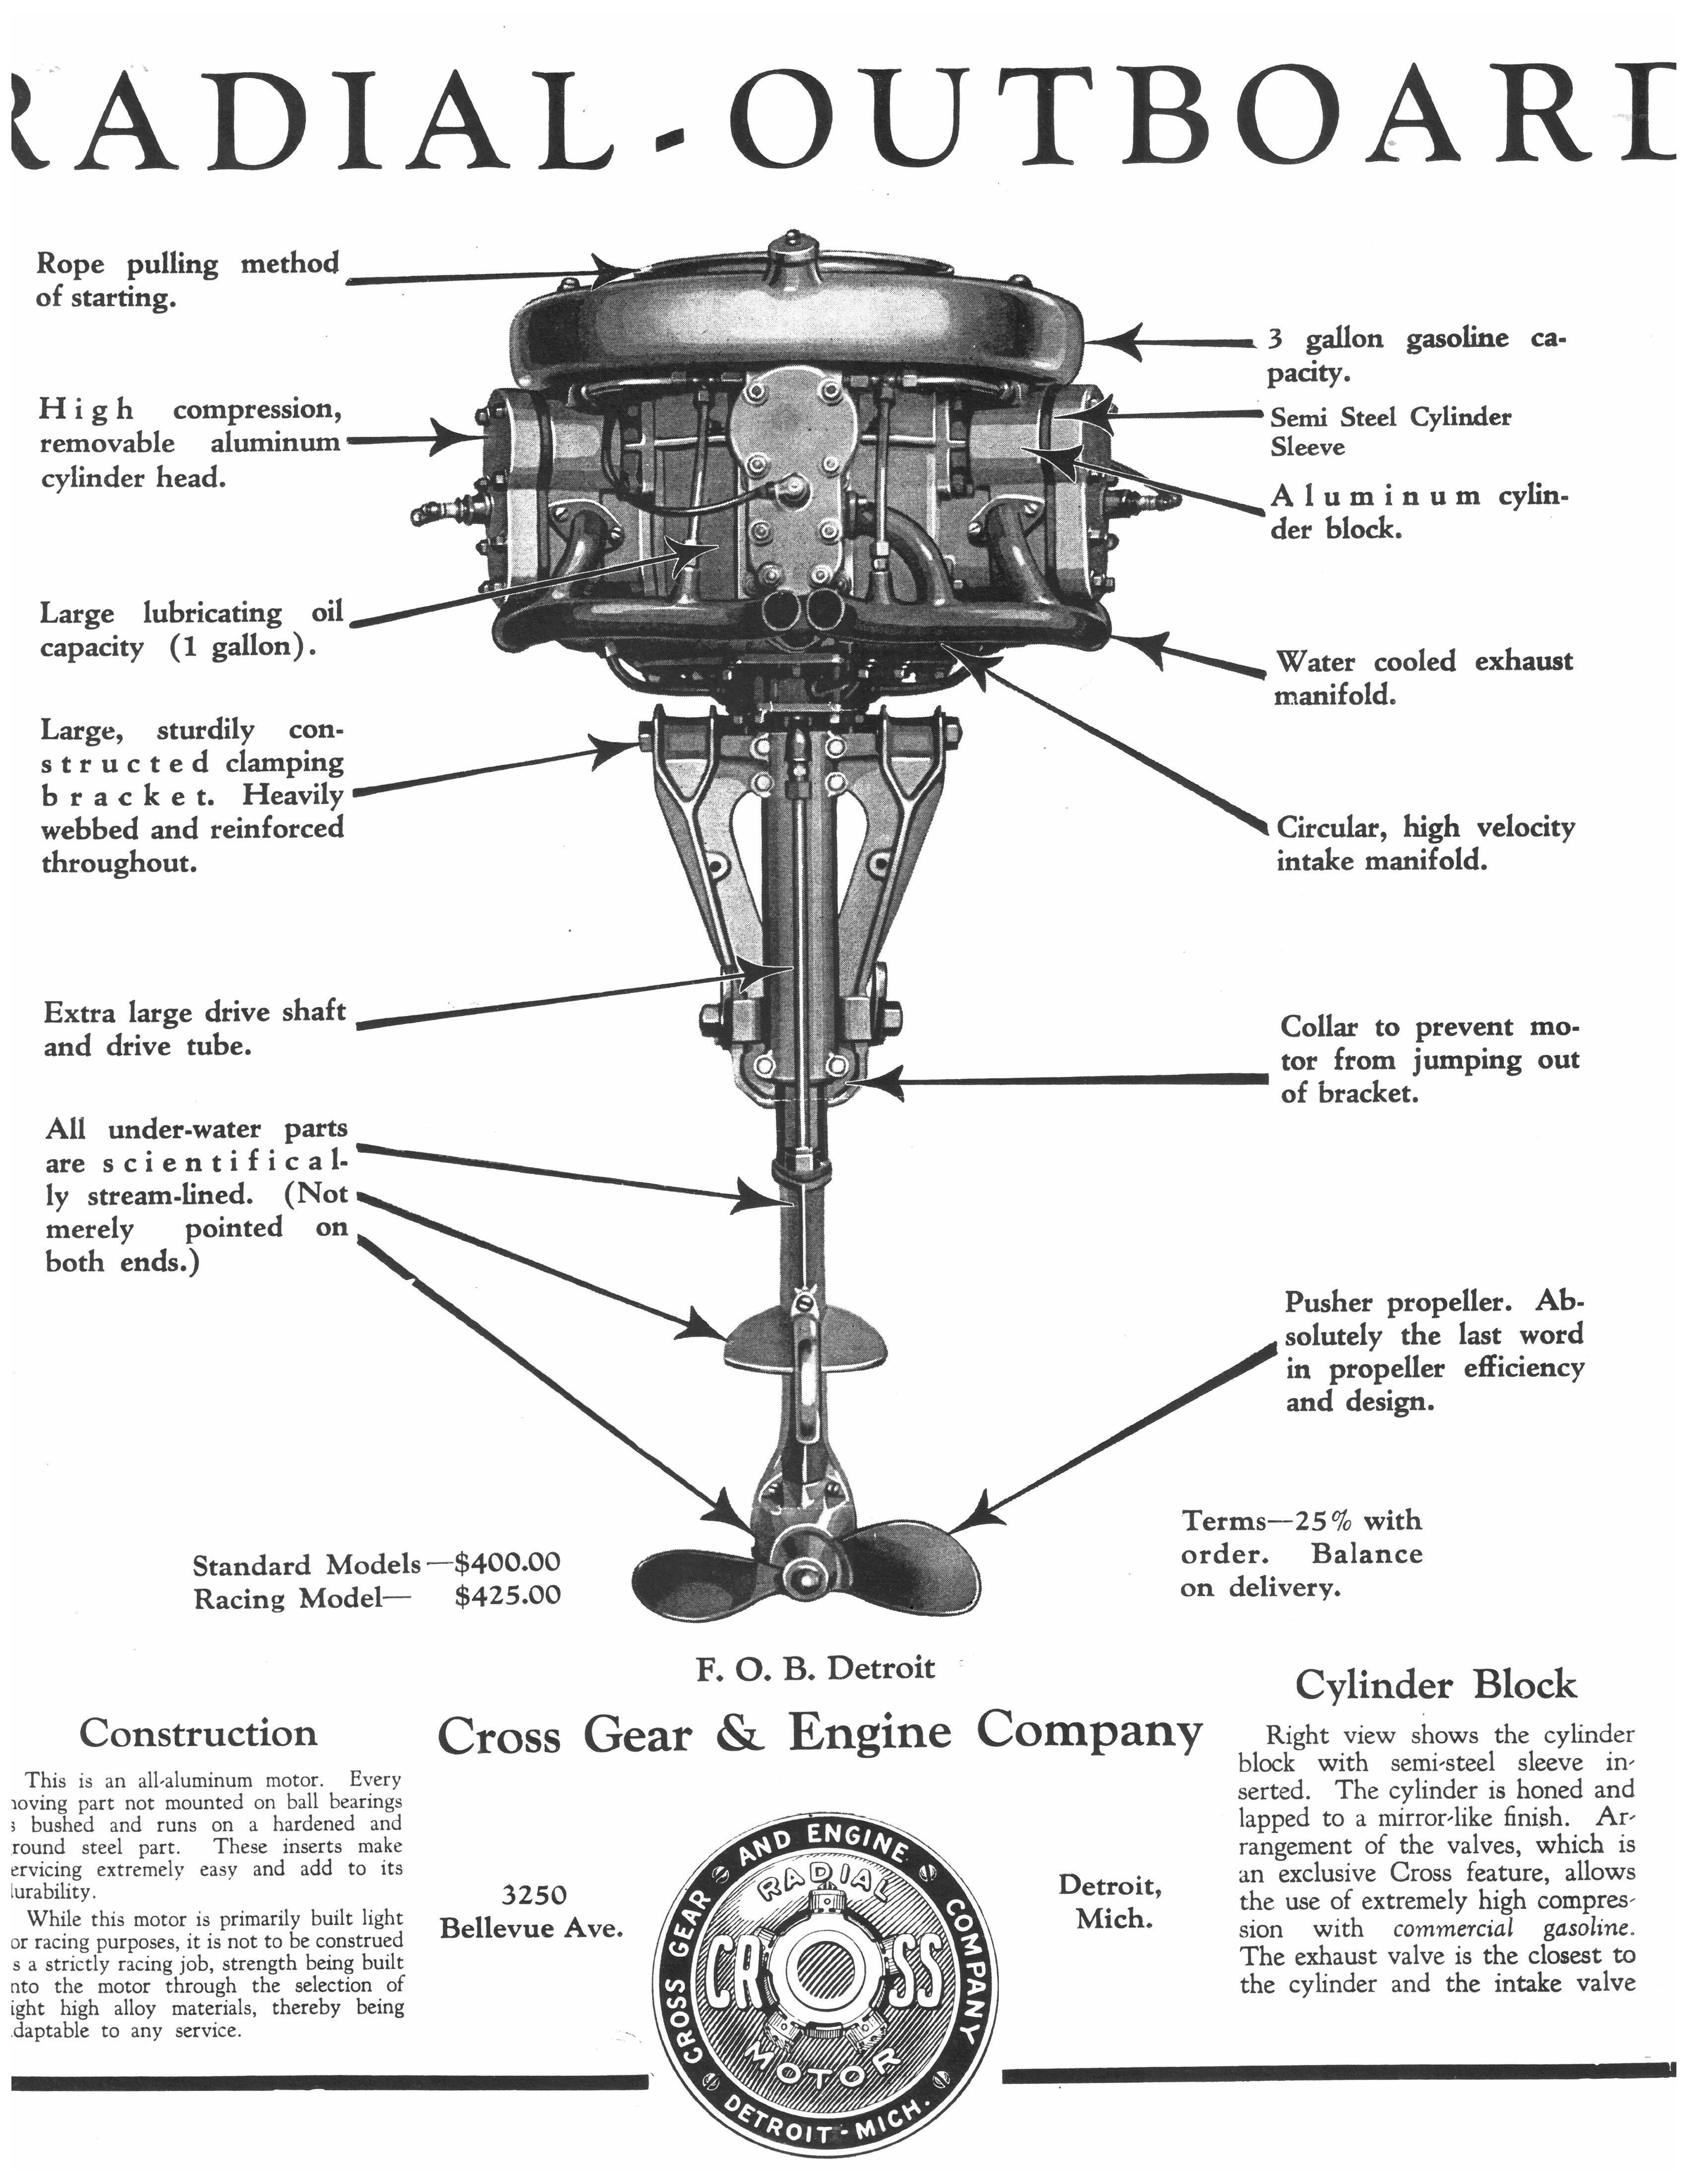 Cross Model 563 Radial 5 Cylinder Outboard Boat Motor